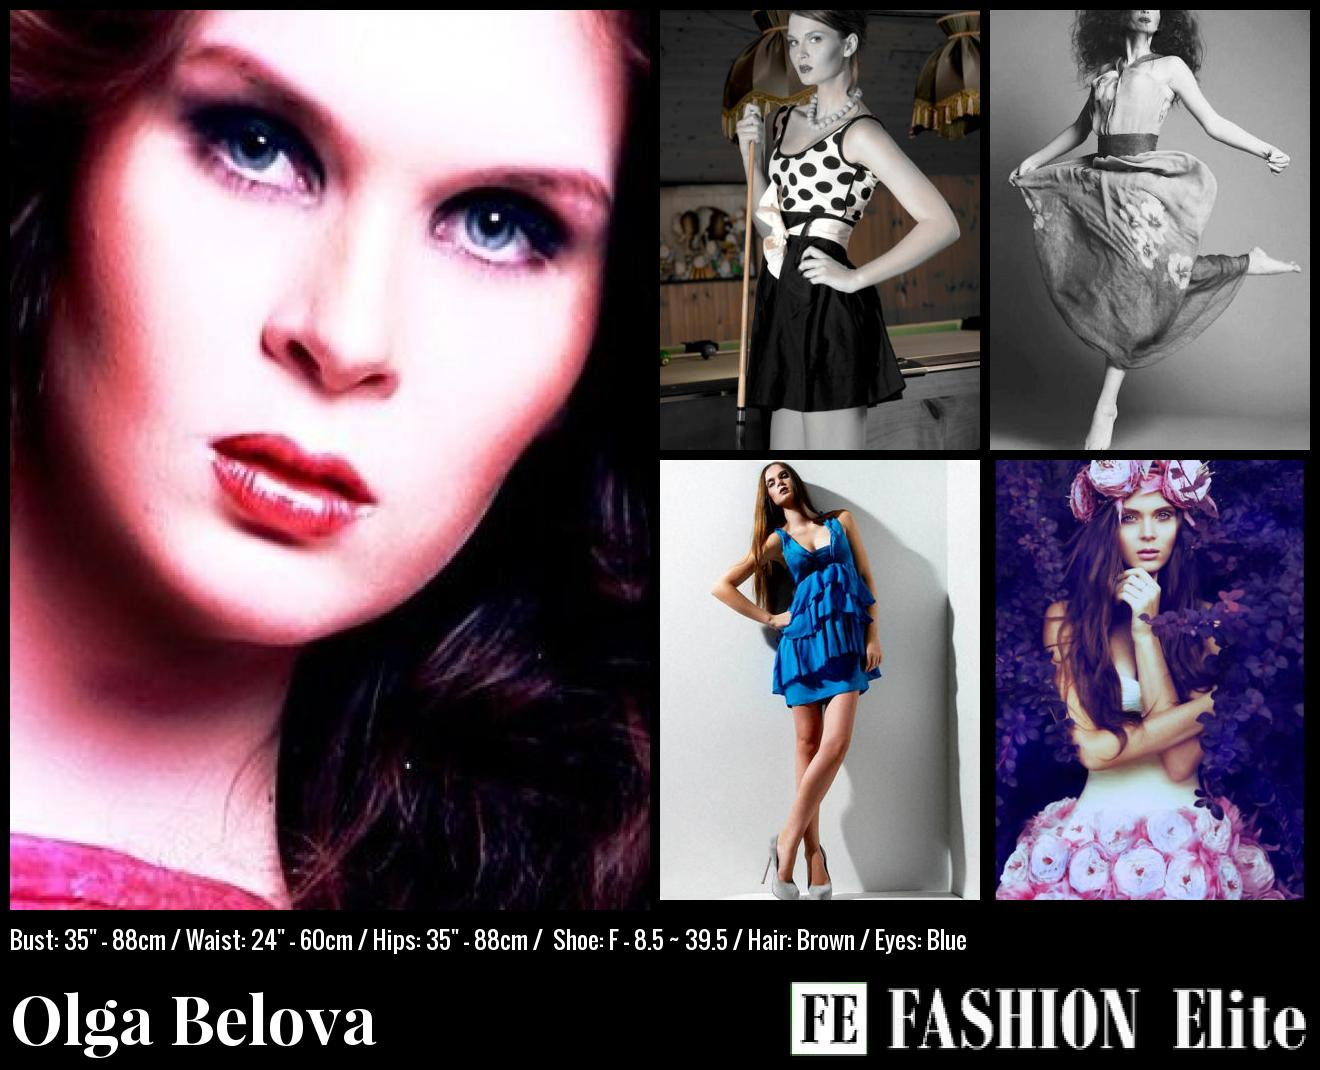 Olga Belova Comp Card